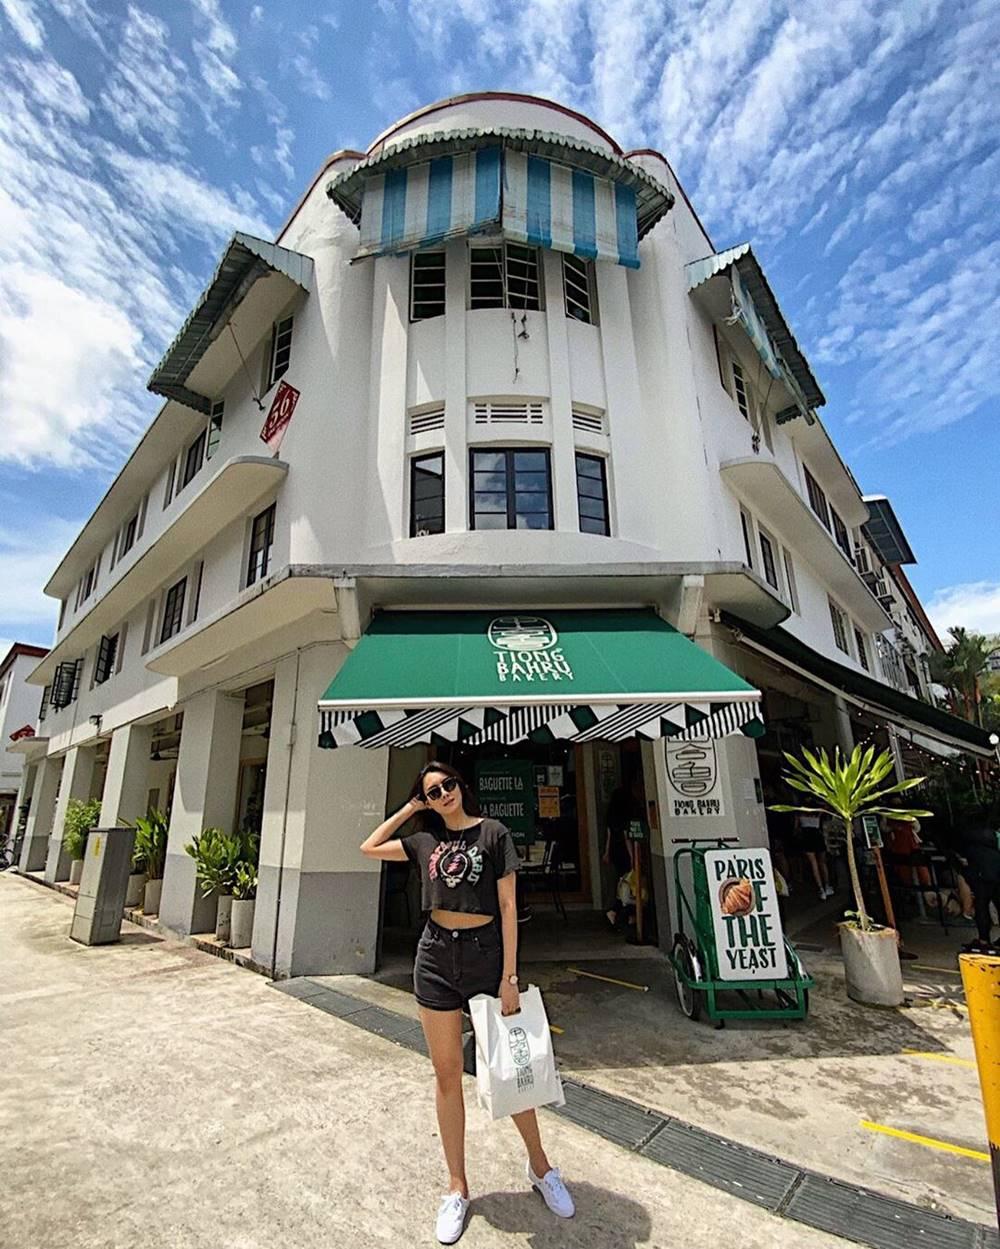 Tiong Bahru Bakery. Instagram @sabaipare